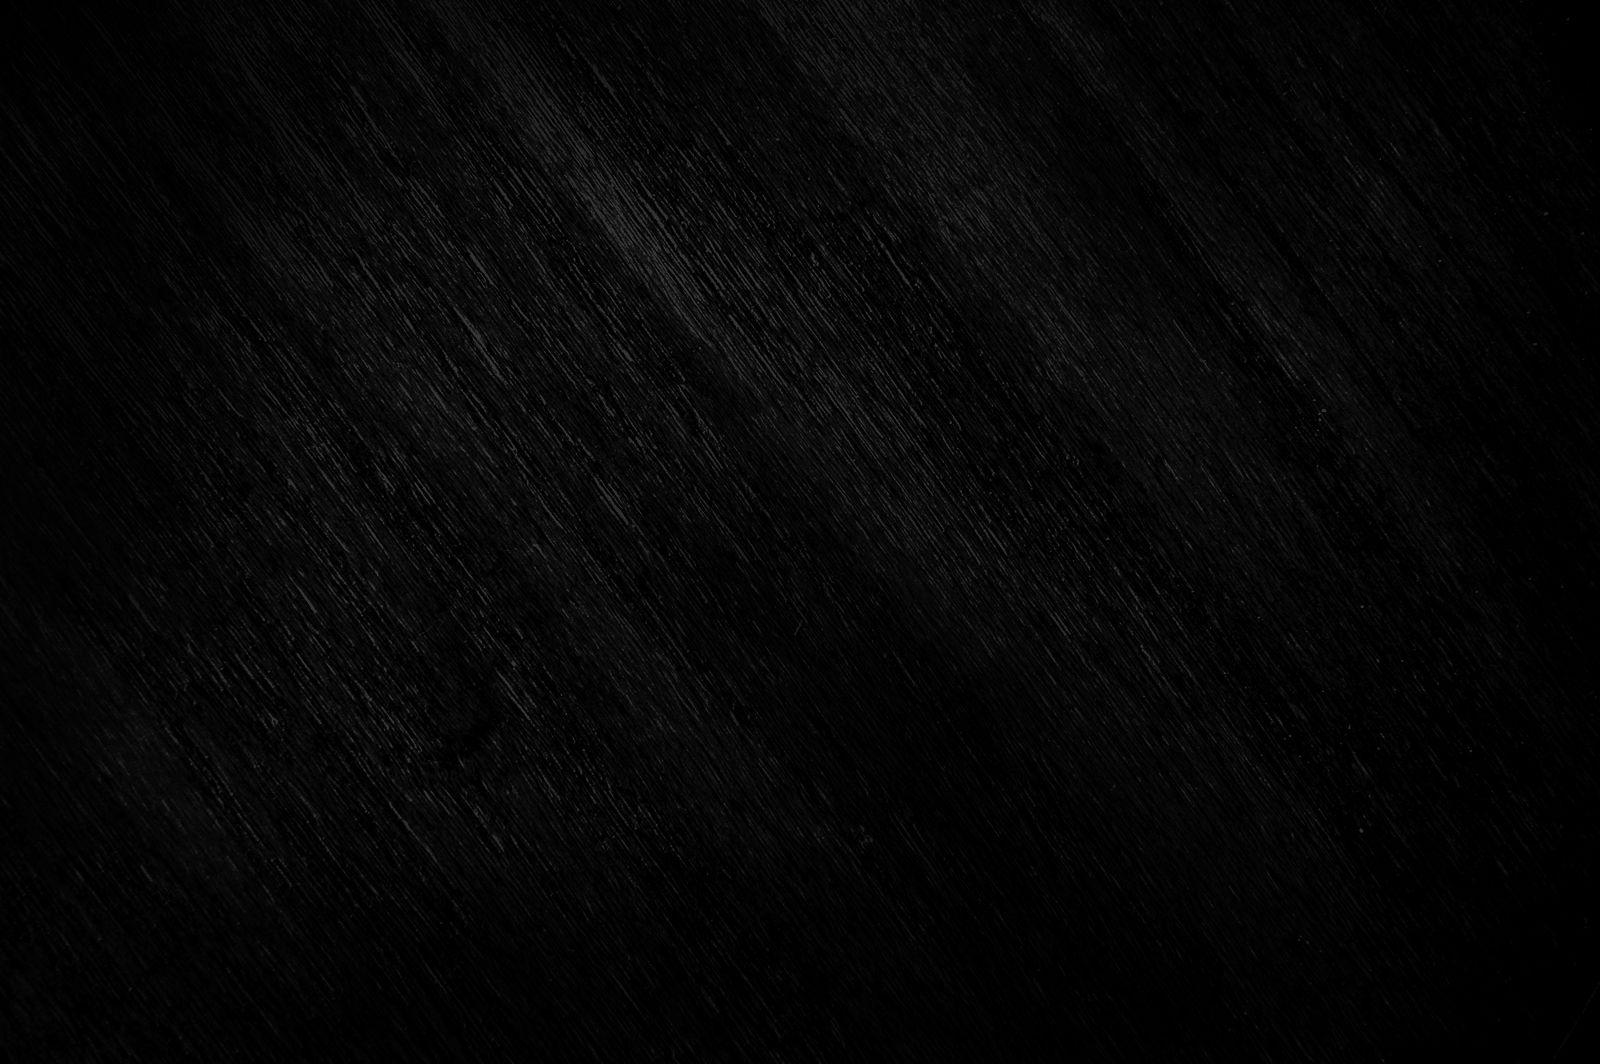 Black Backgrounds Dark Pics 23884wall